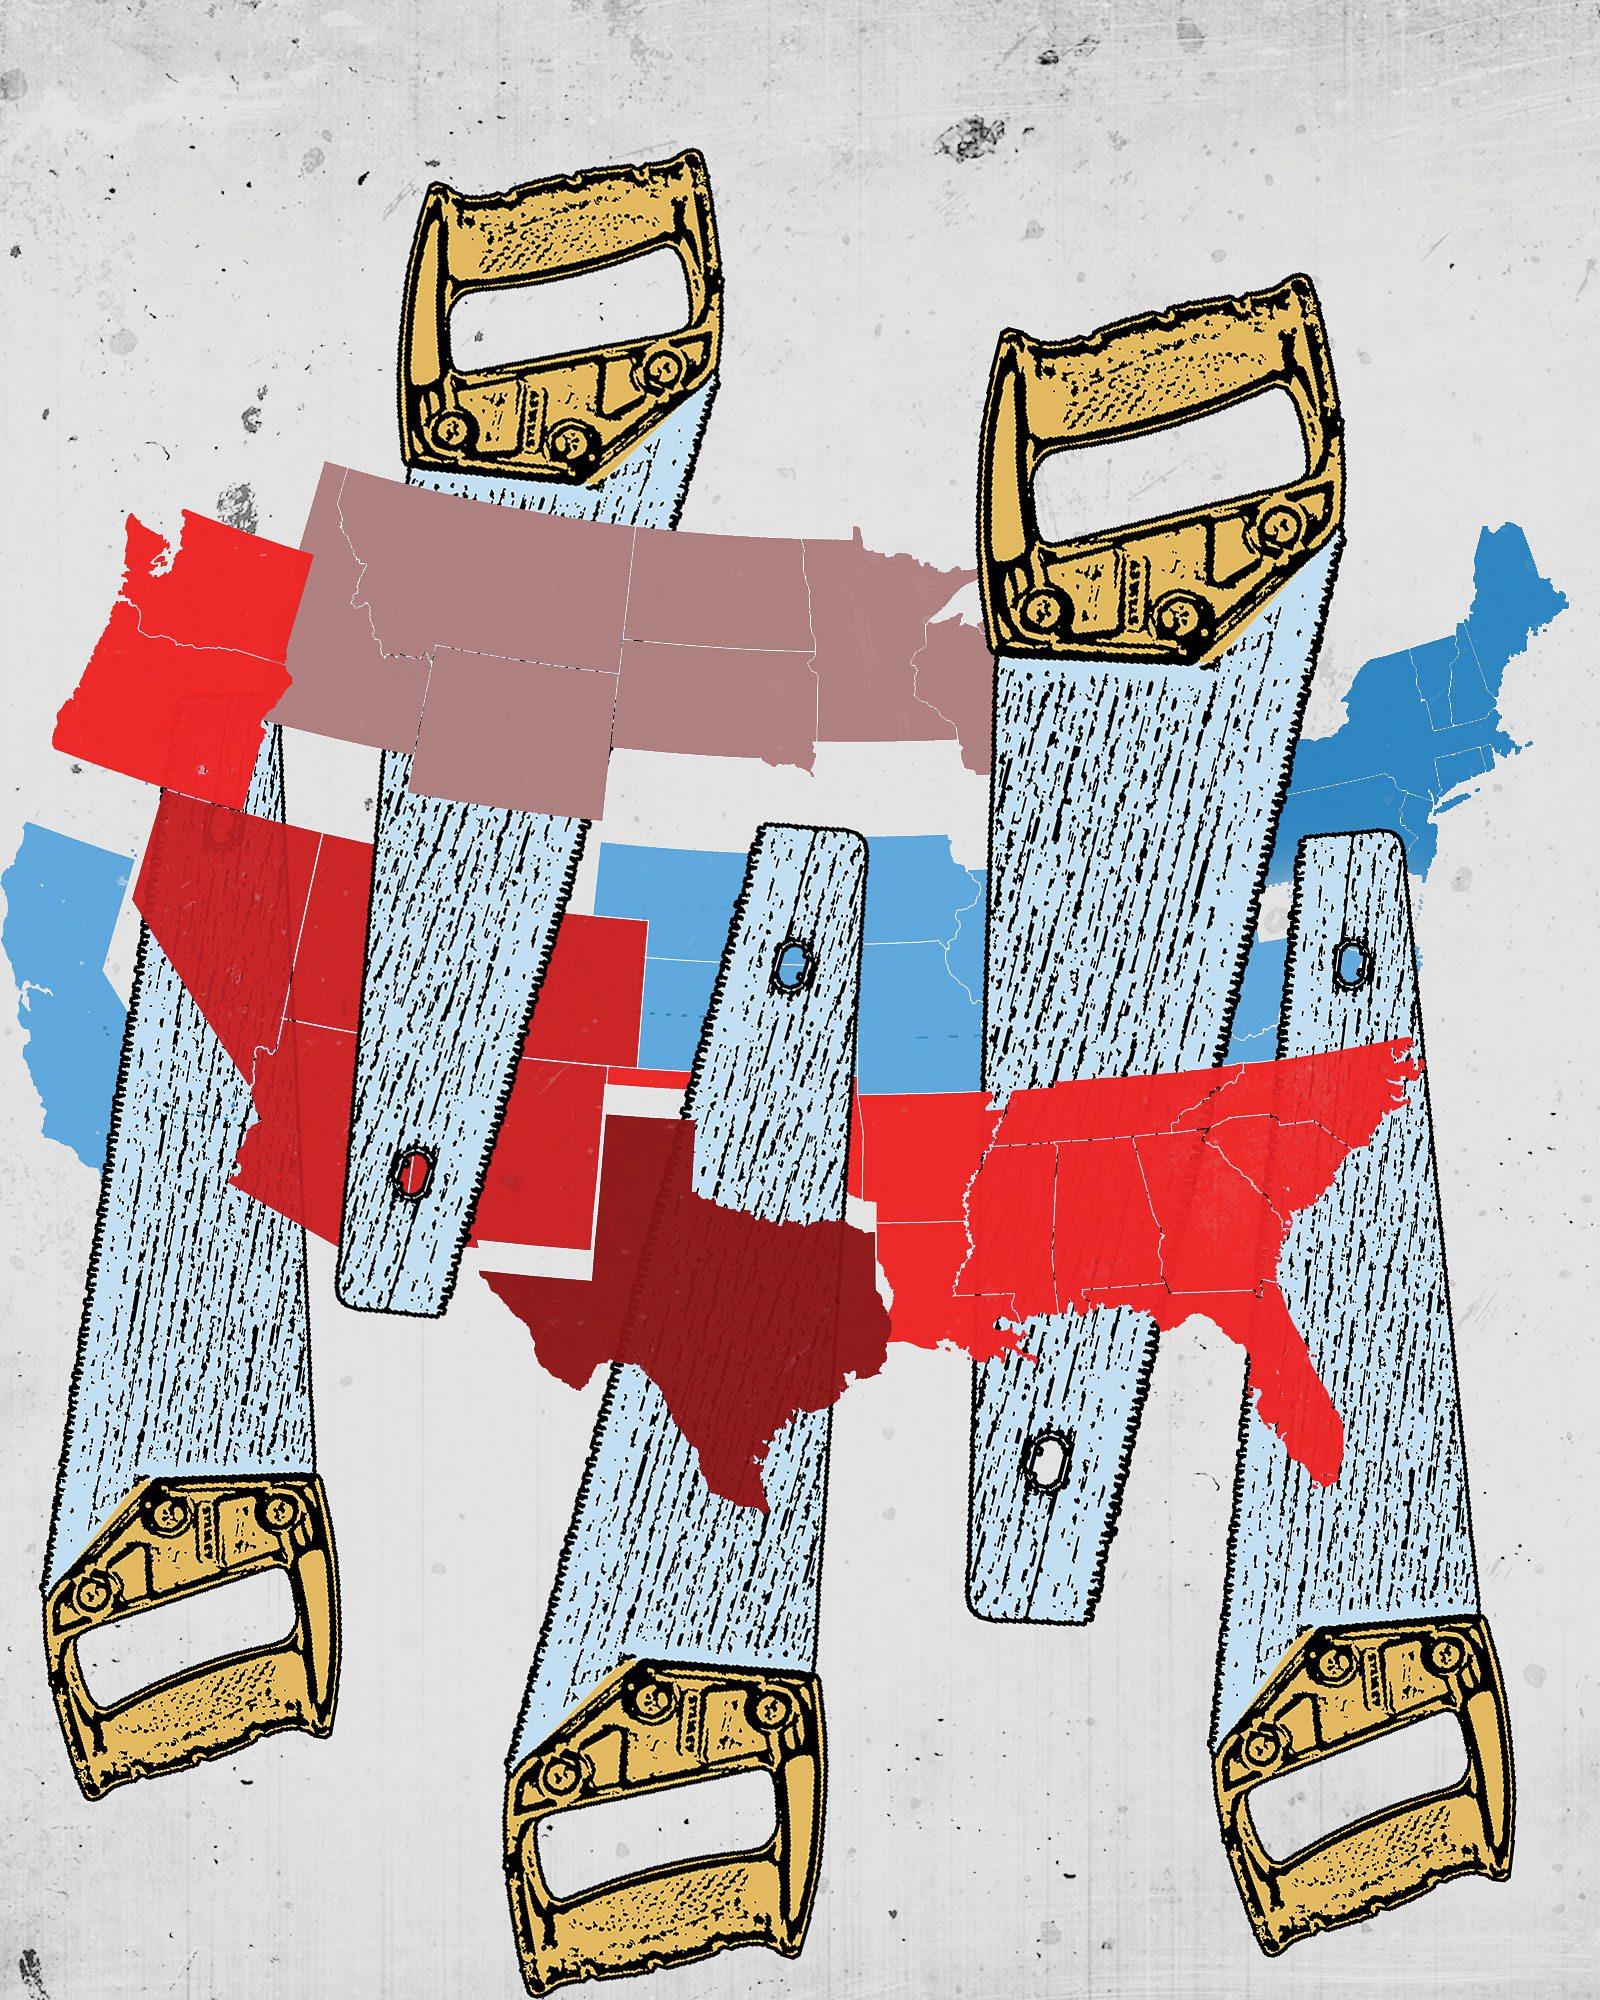 Embracing the state secession movement: 'Make America small again'